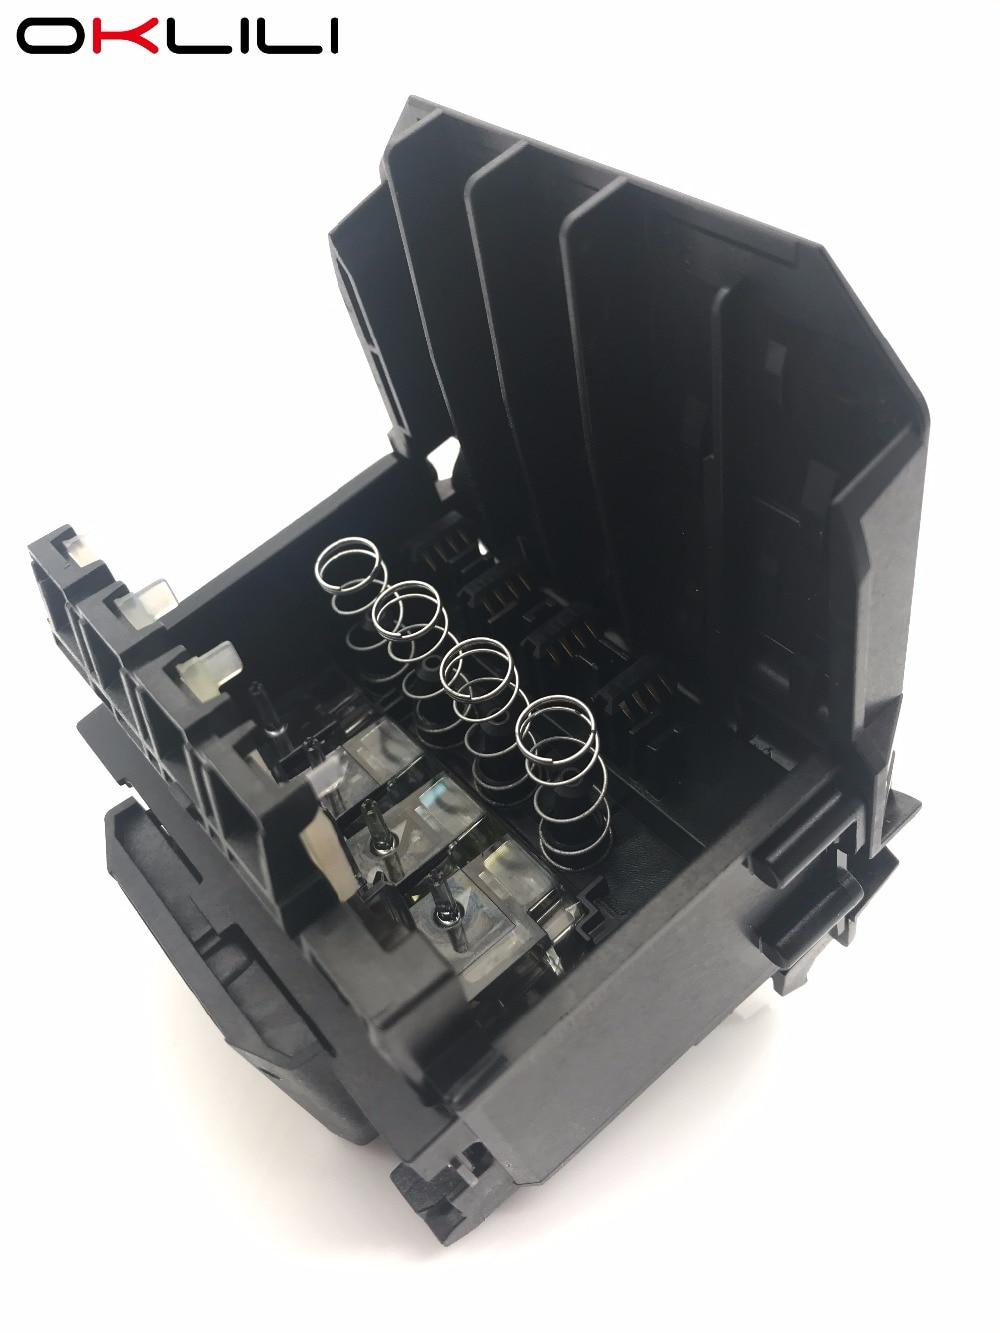 Printer Spare Parts 5Set 932 933 932Xl 933Xl Printhead Printer Print Head Cable for HP Officejet 6060 6060E 6100 6100E 6600 6700 7110 7600 7610 7612